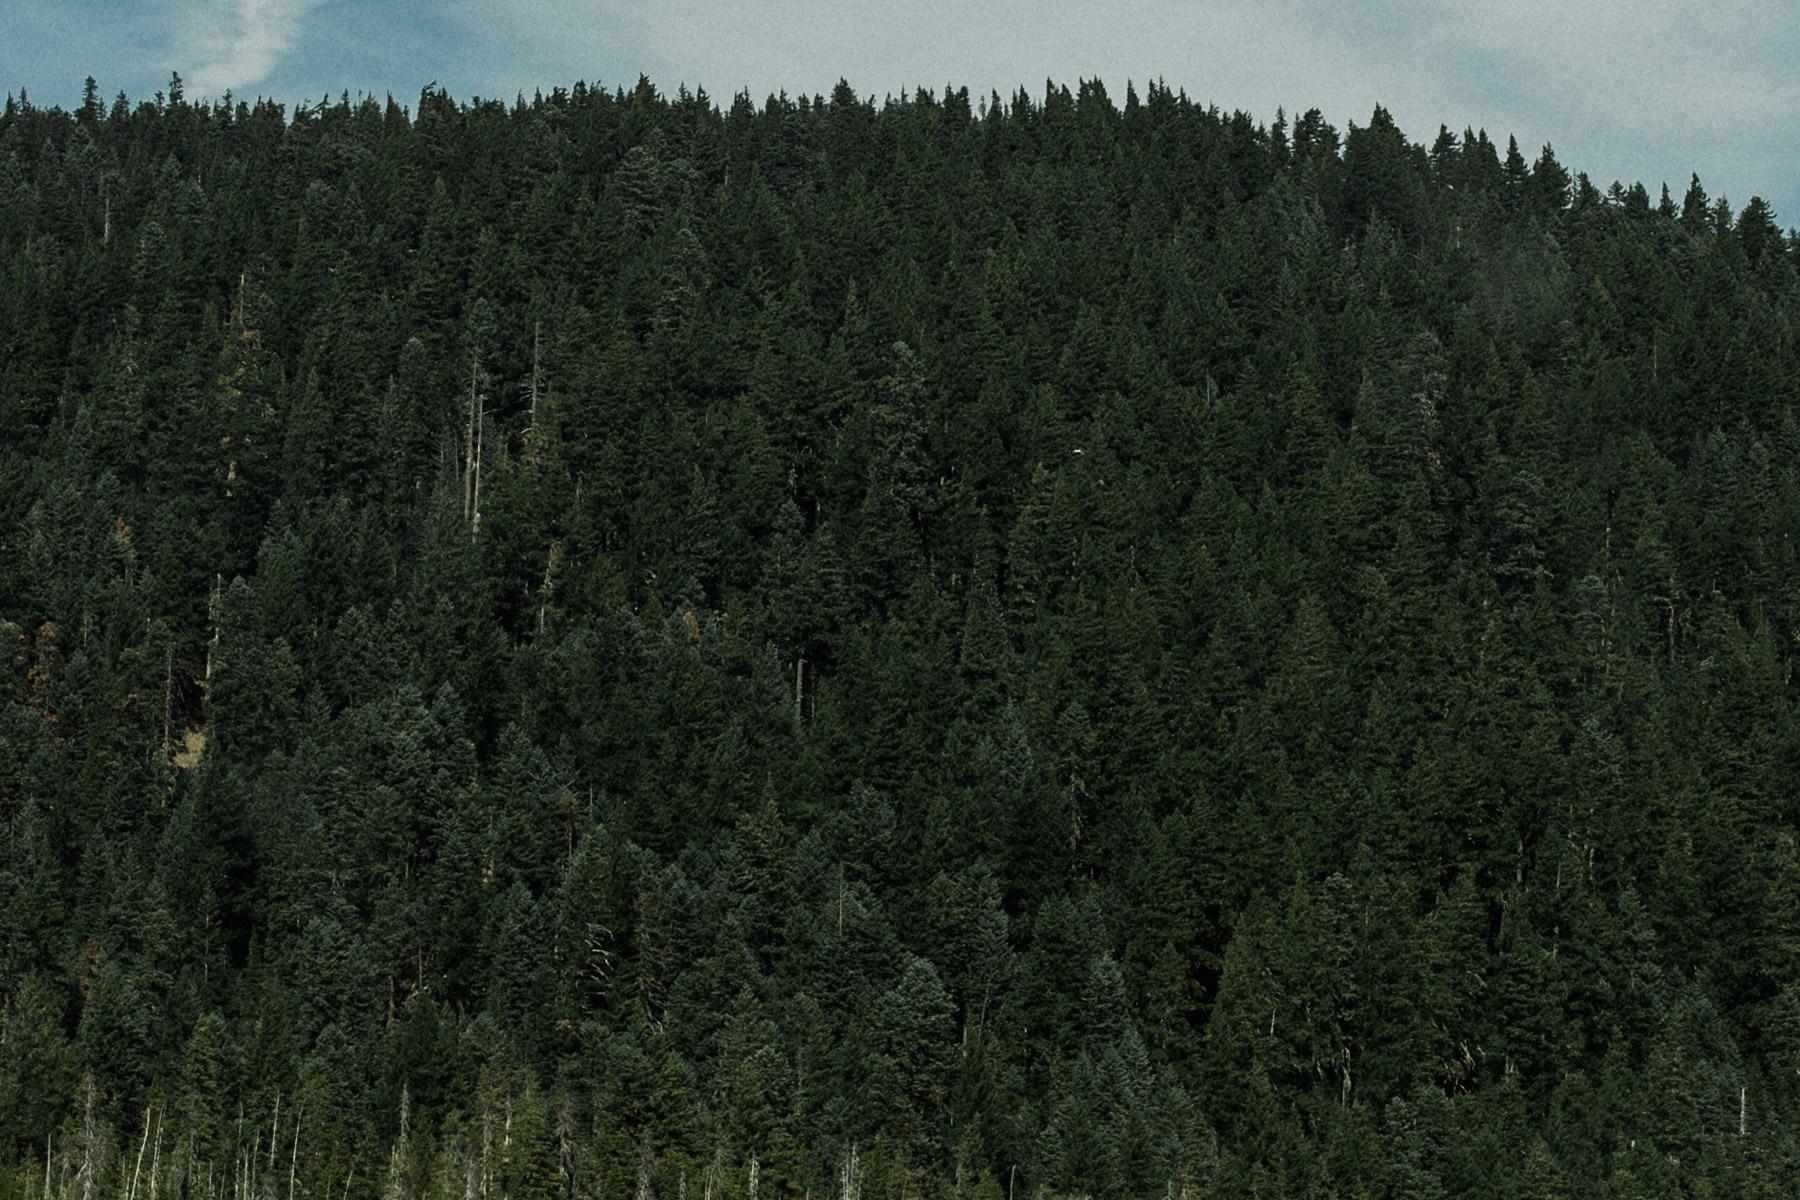 Mount Hood | Kelly in the City